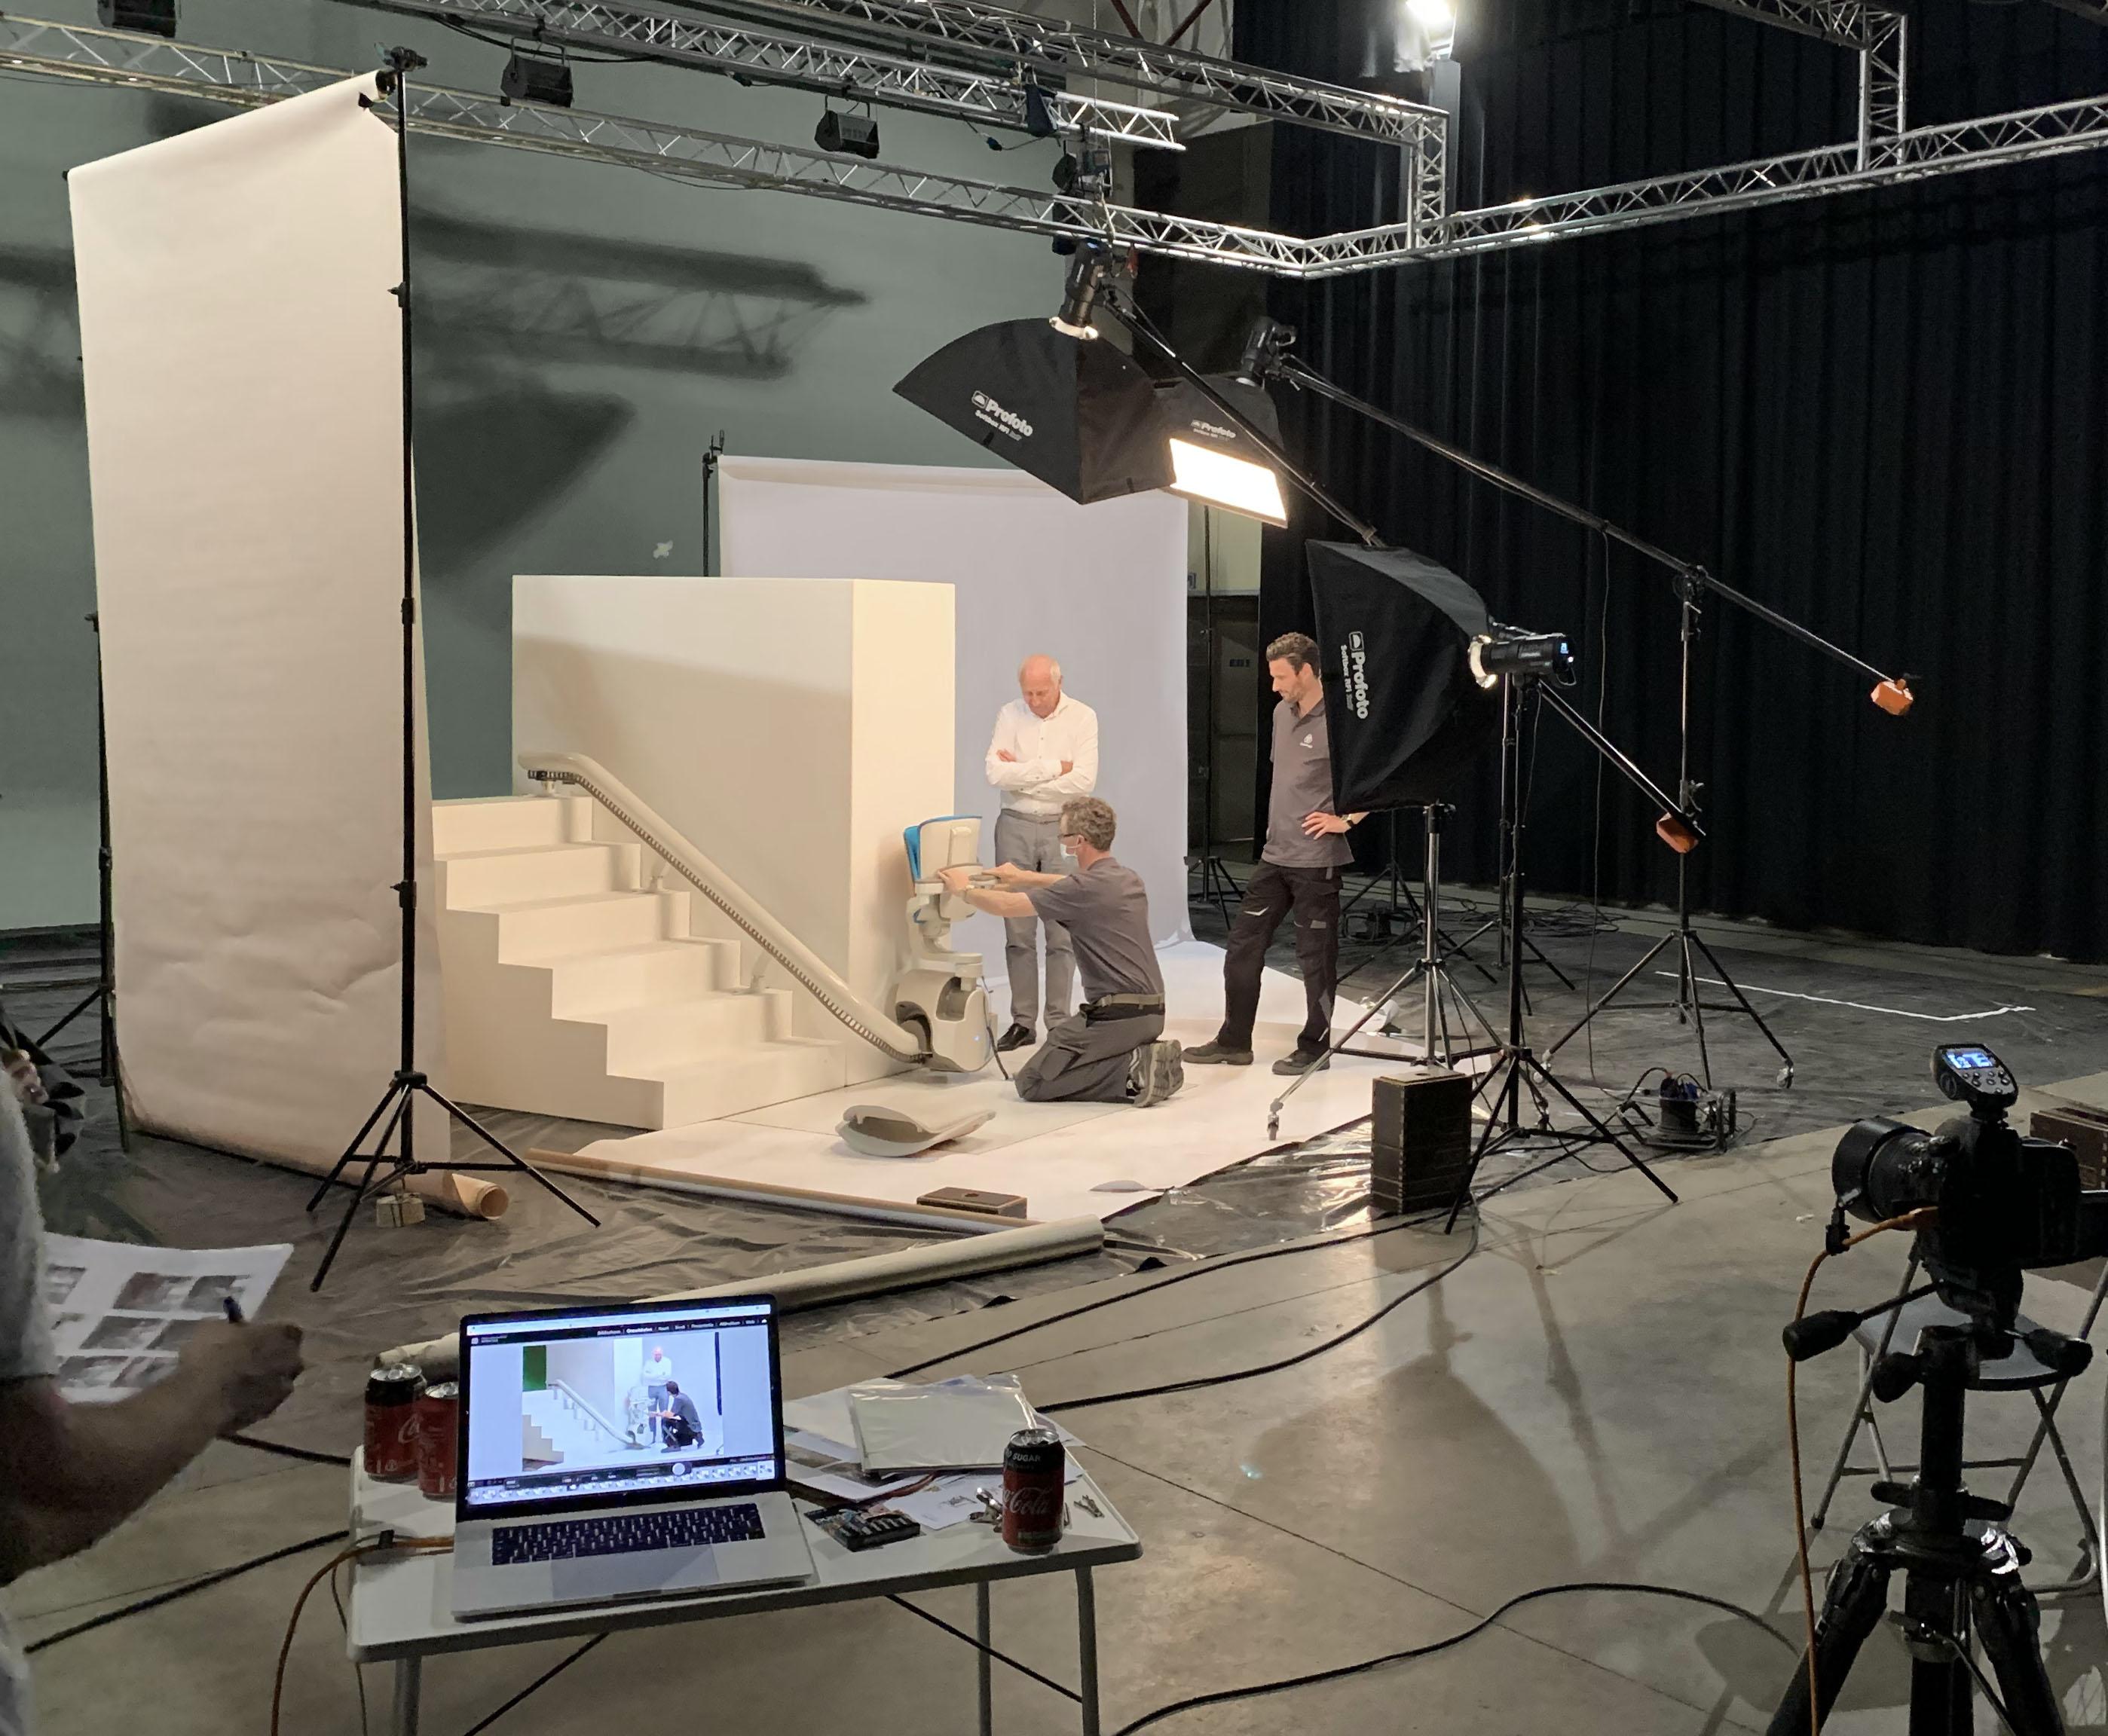 arthurlosfotografie -Behind the scenes